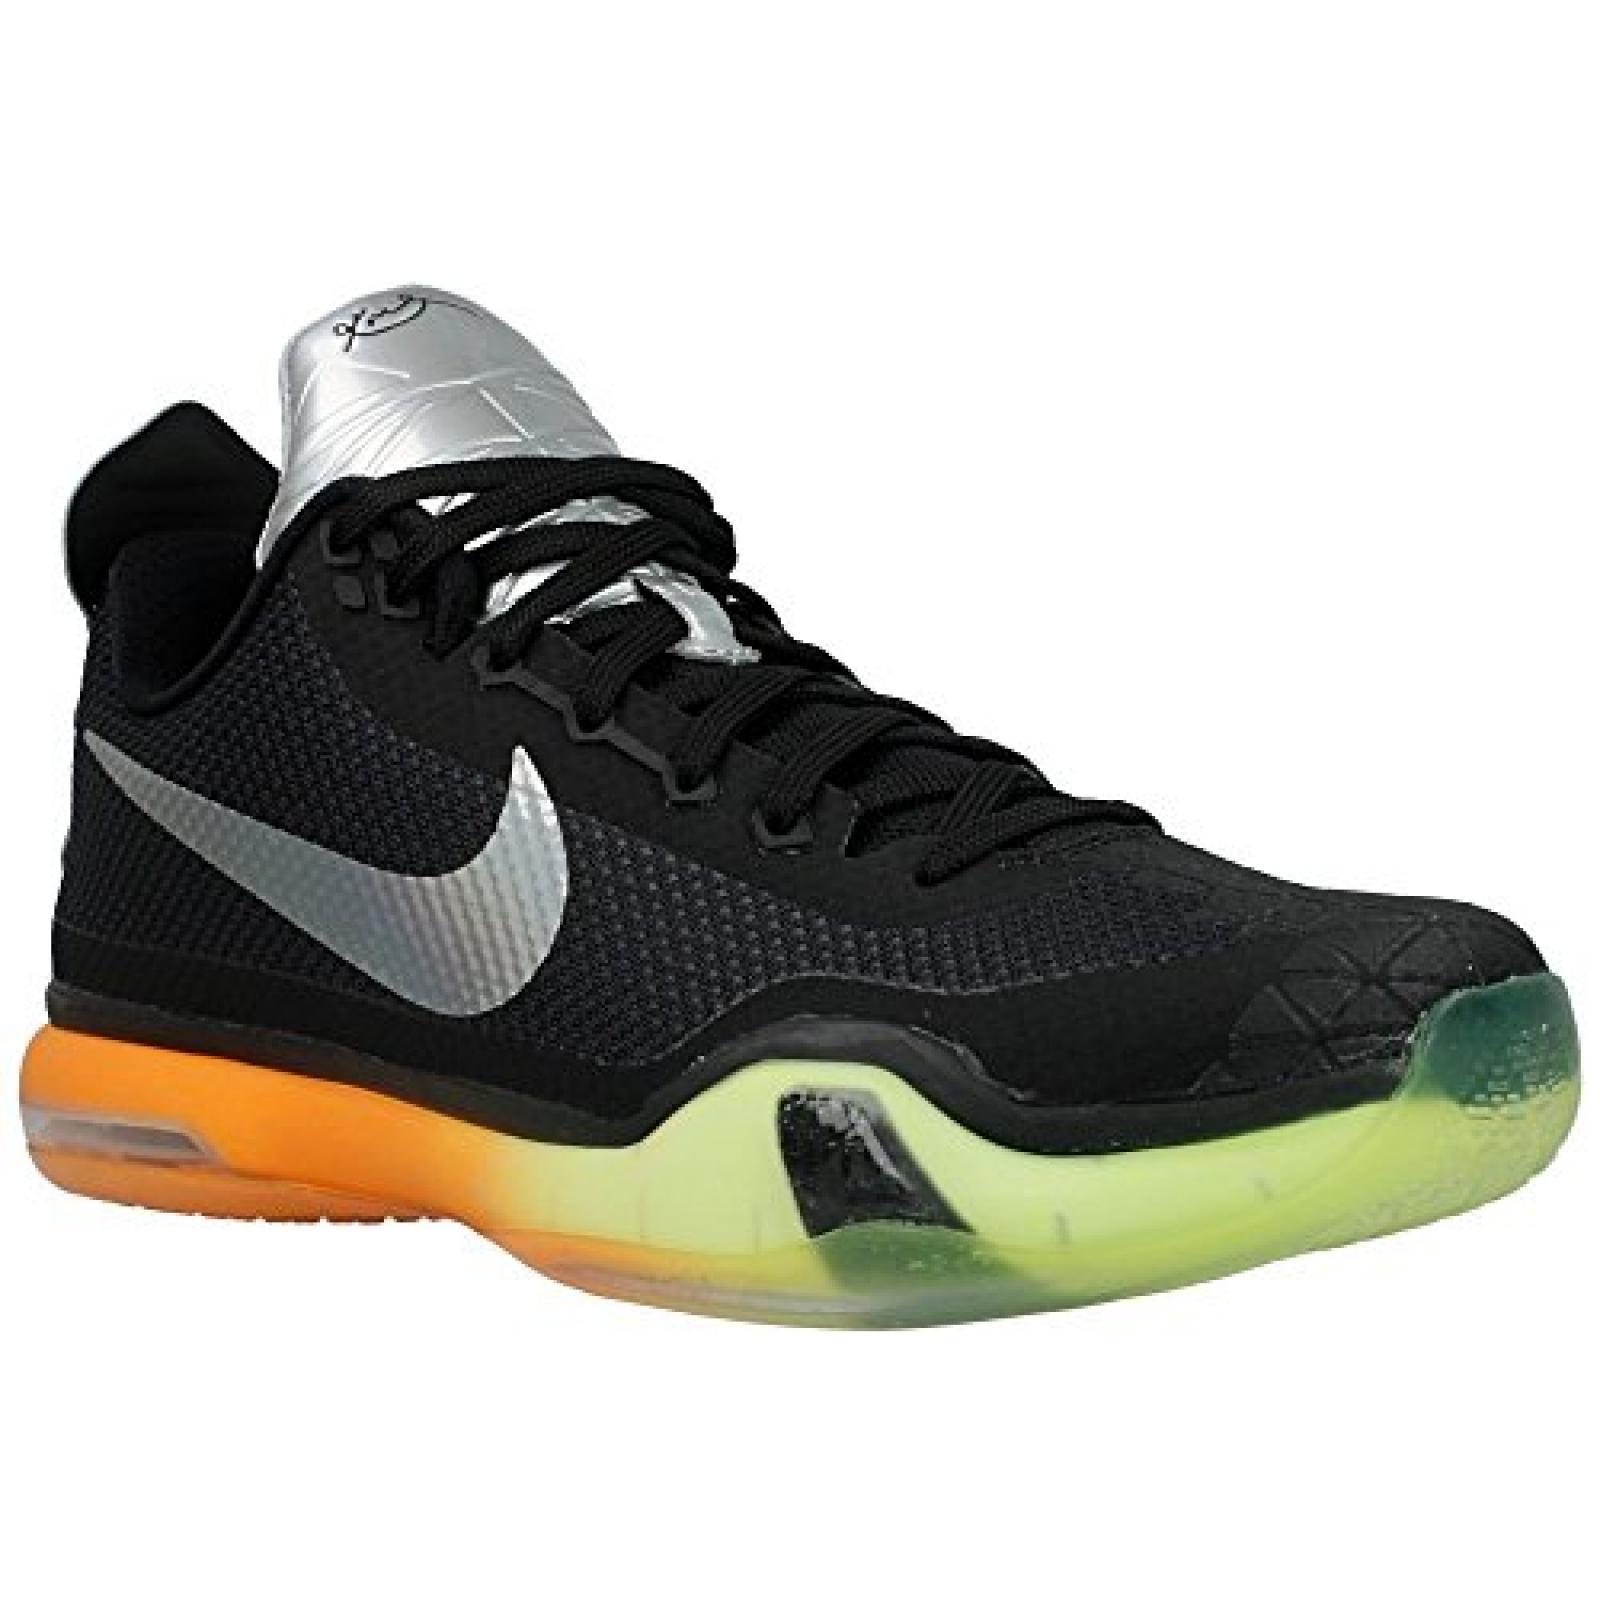 Nike - Kobe X AS